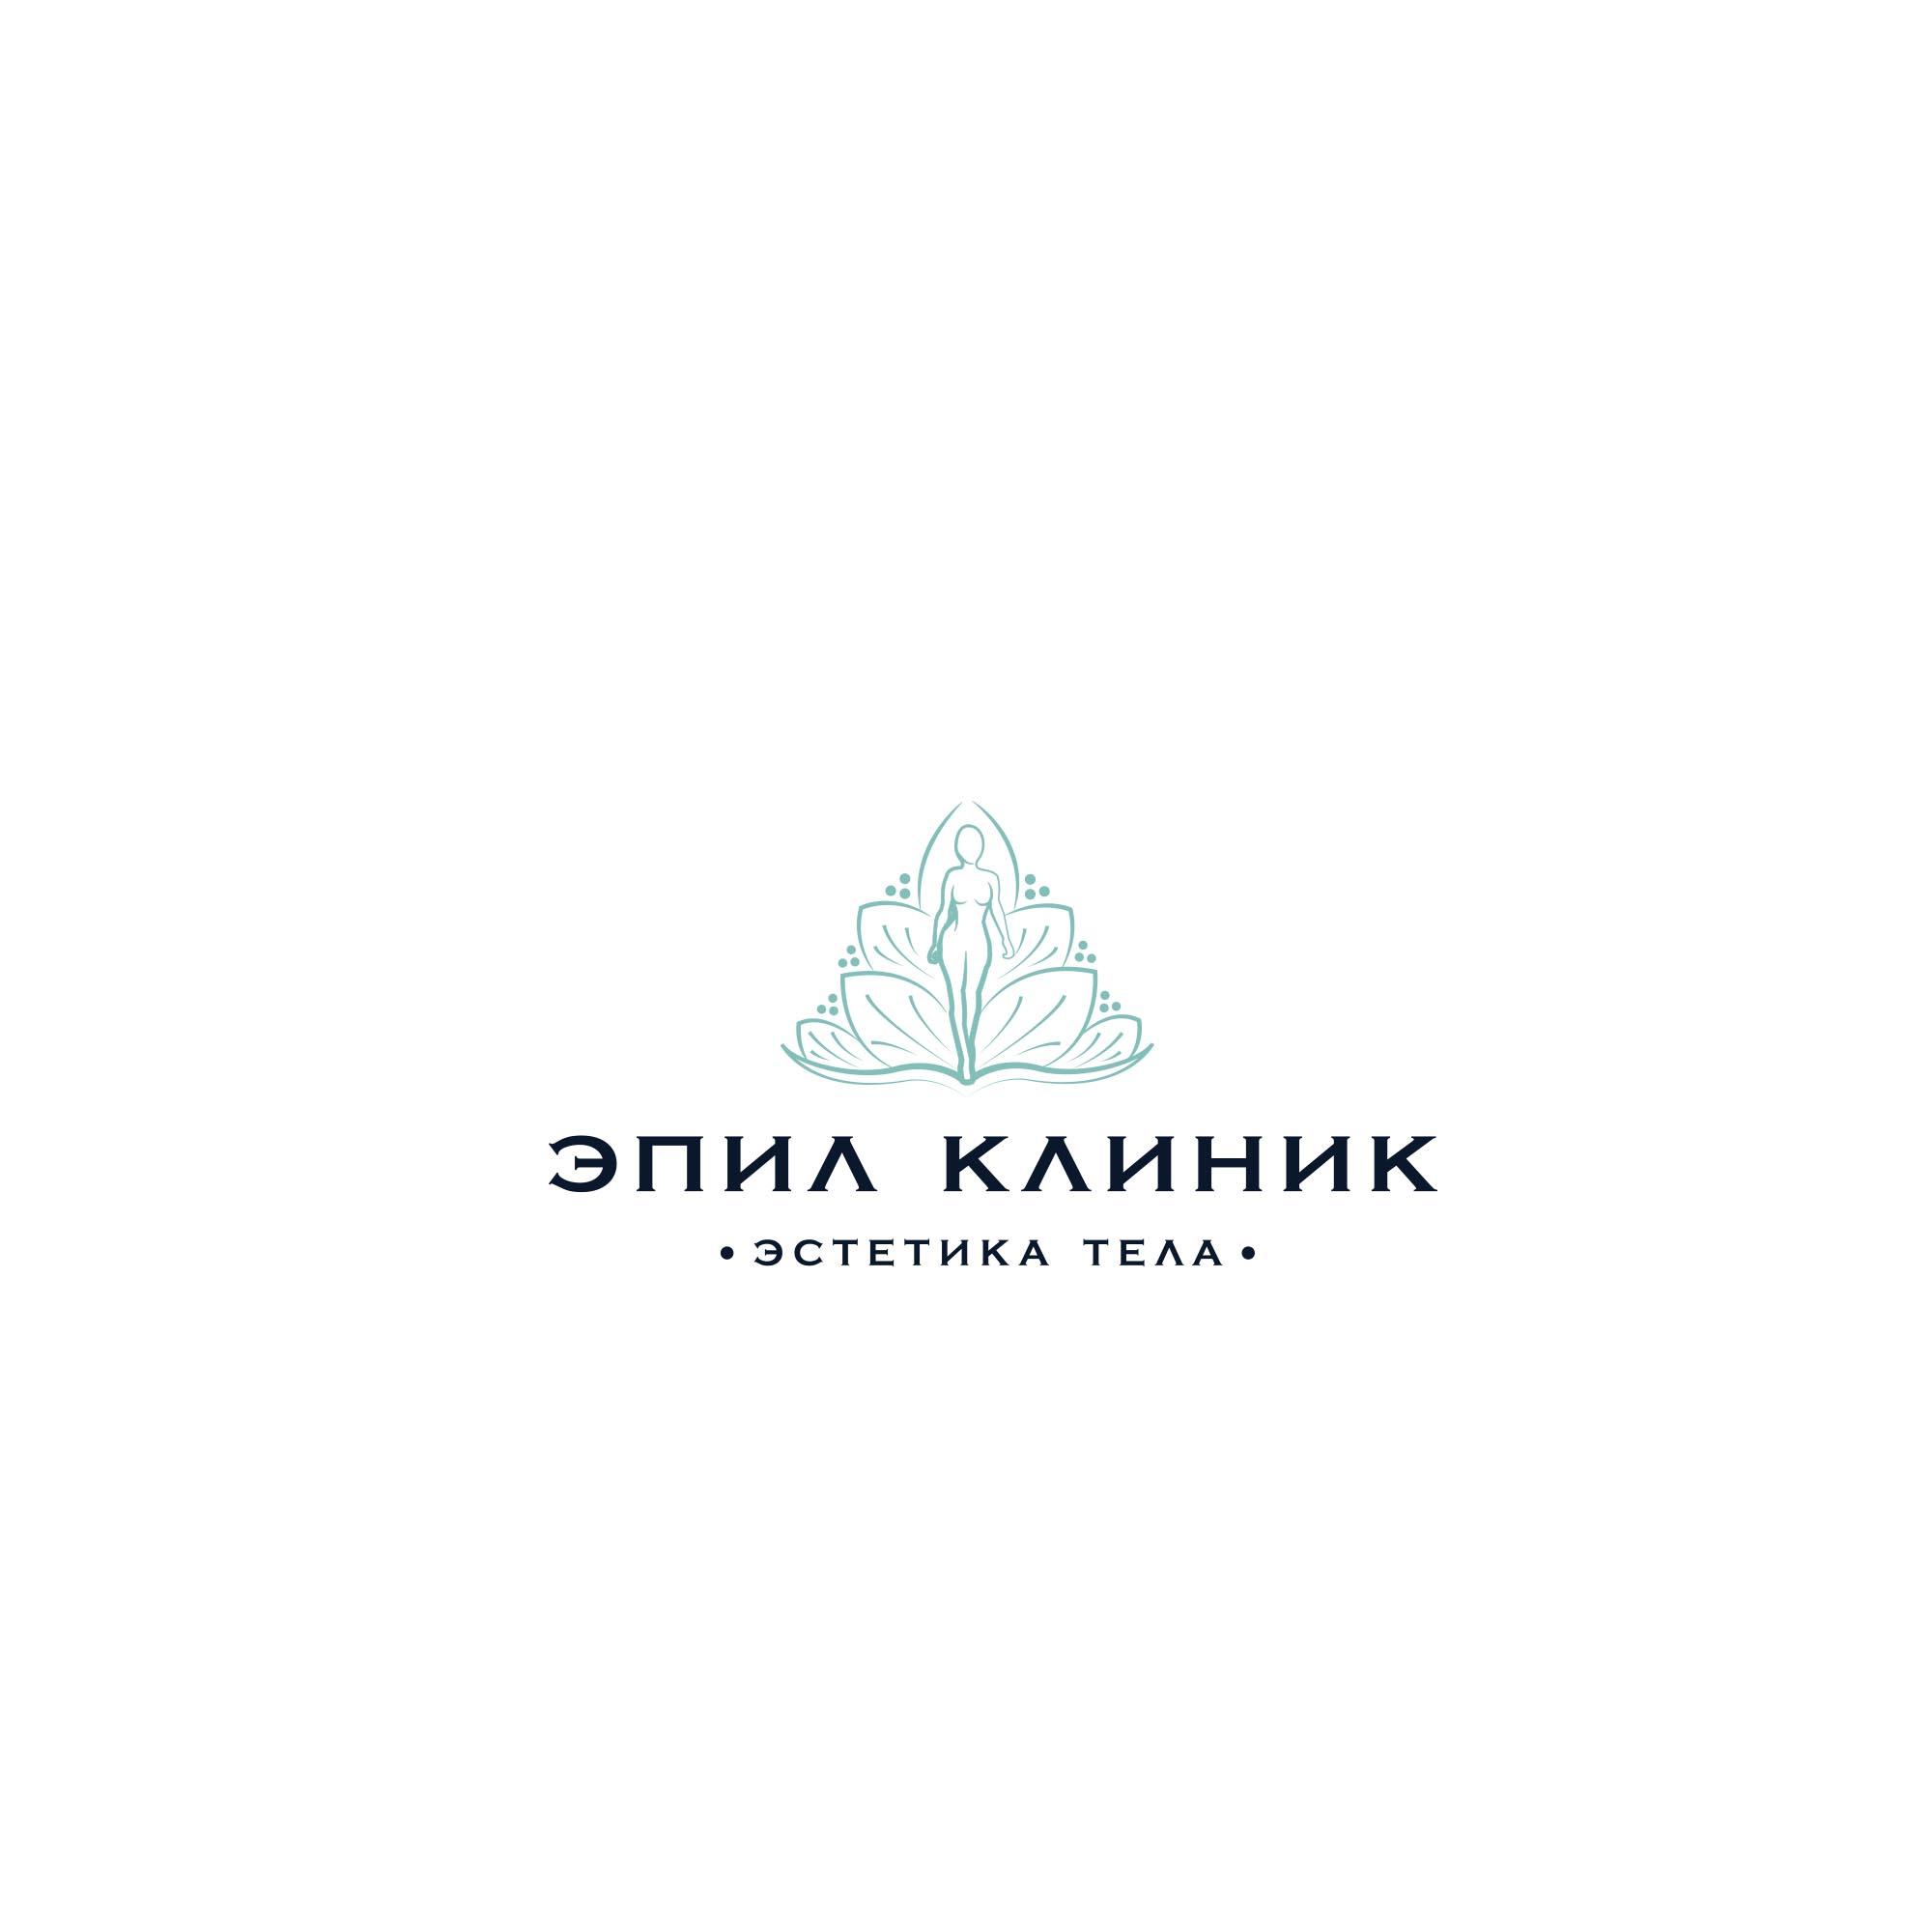 Логотип , фирменный стиль  фото f_5325e18150eec6ff.jpg